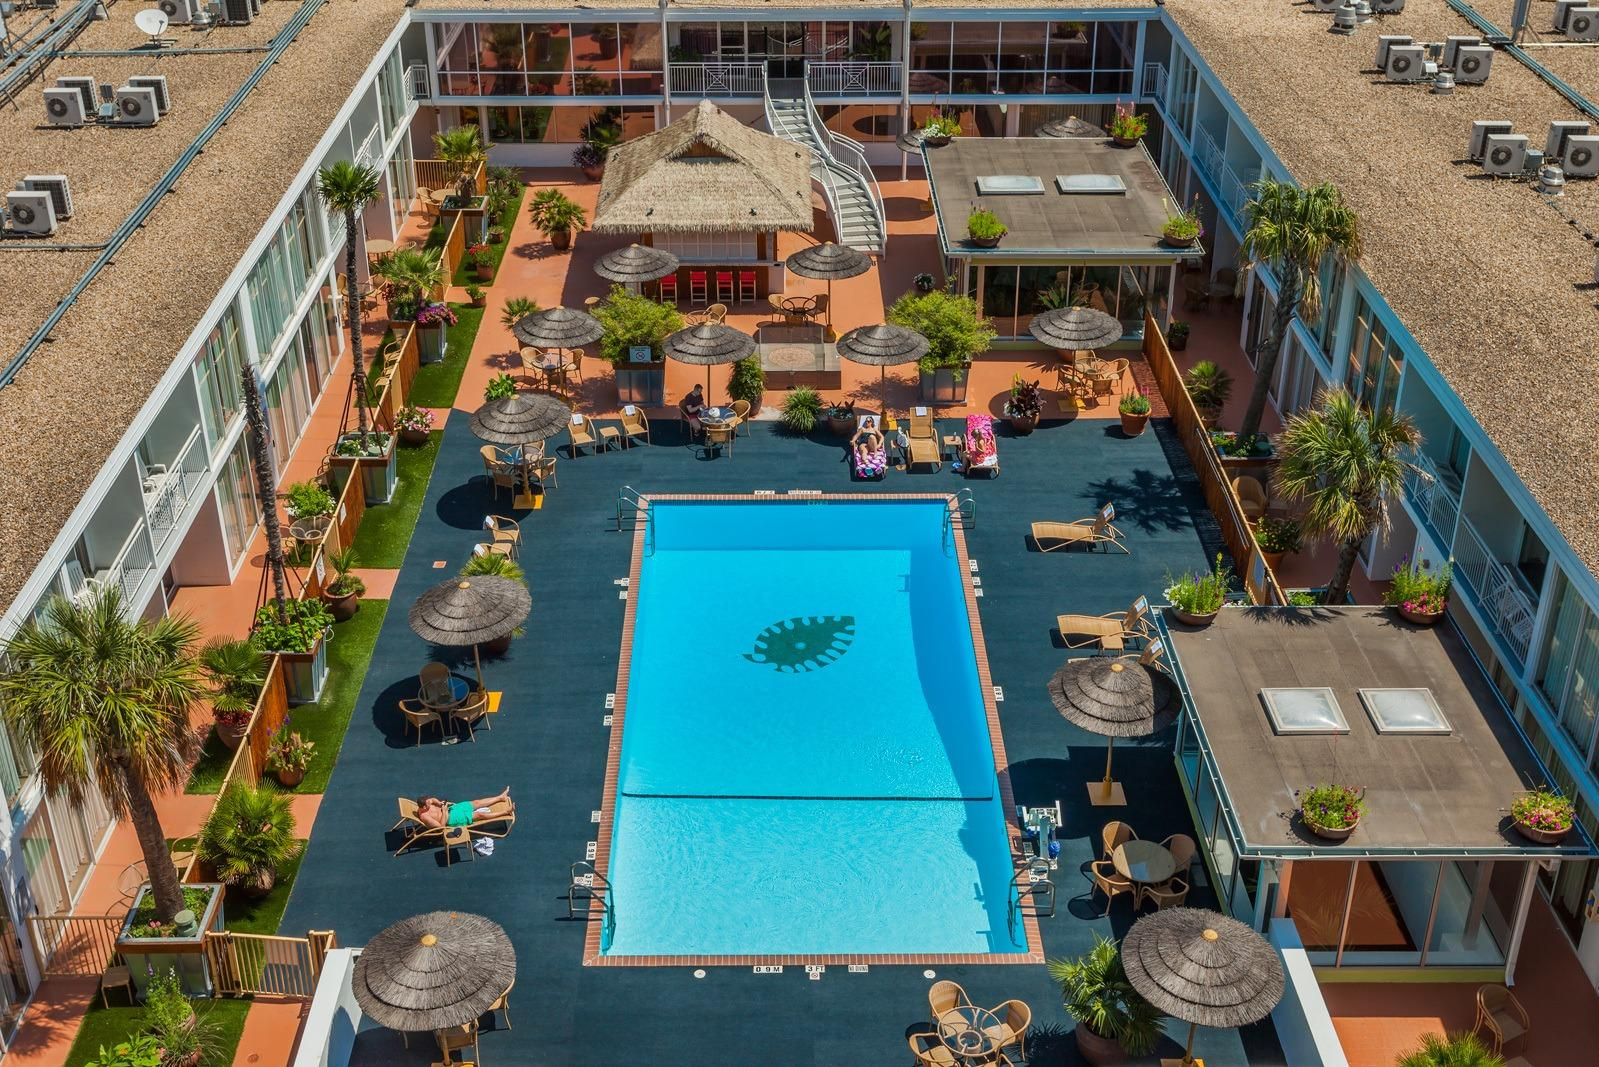 Hotels Right On The Riverwalk In San Antonio Tx